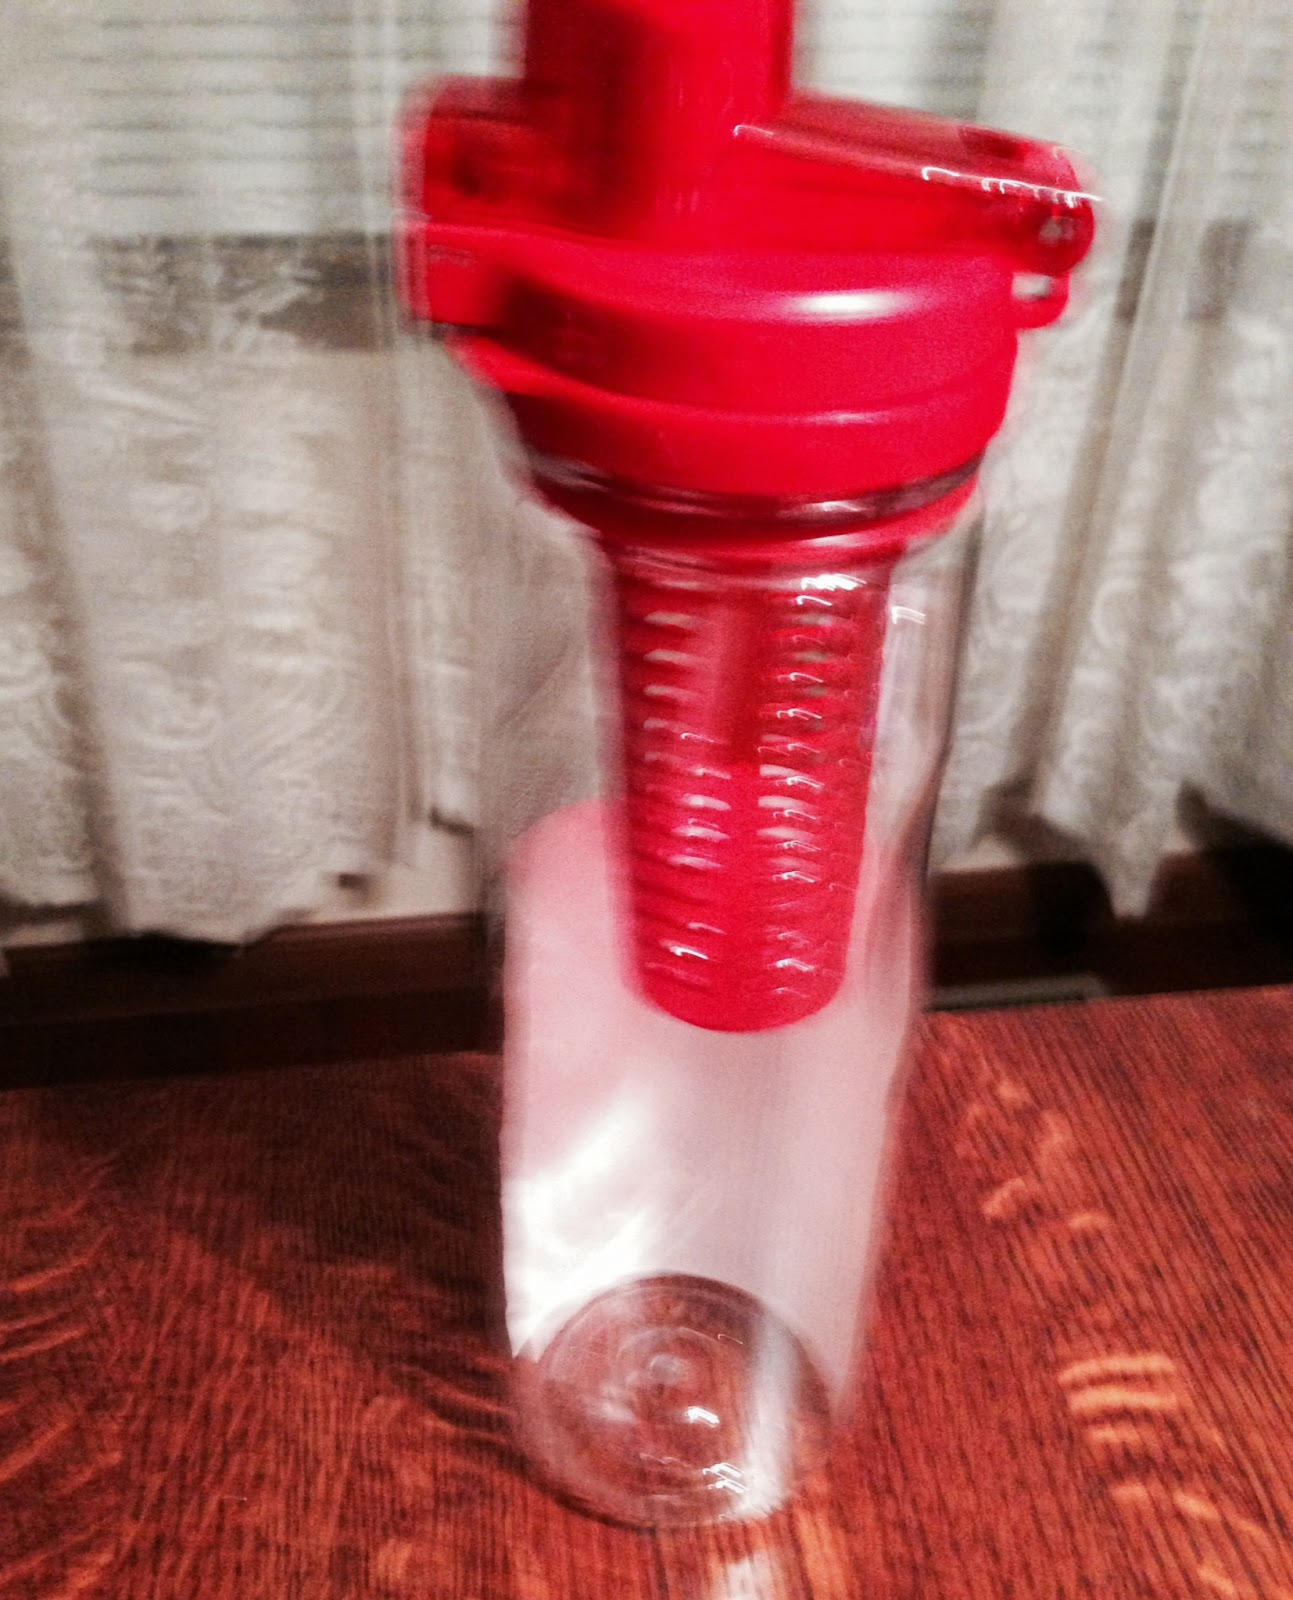 red-water-bottle-interest